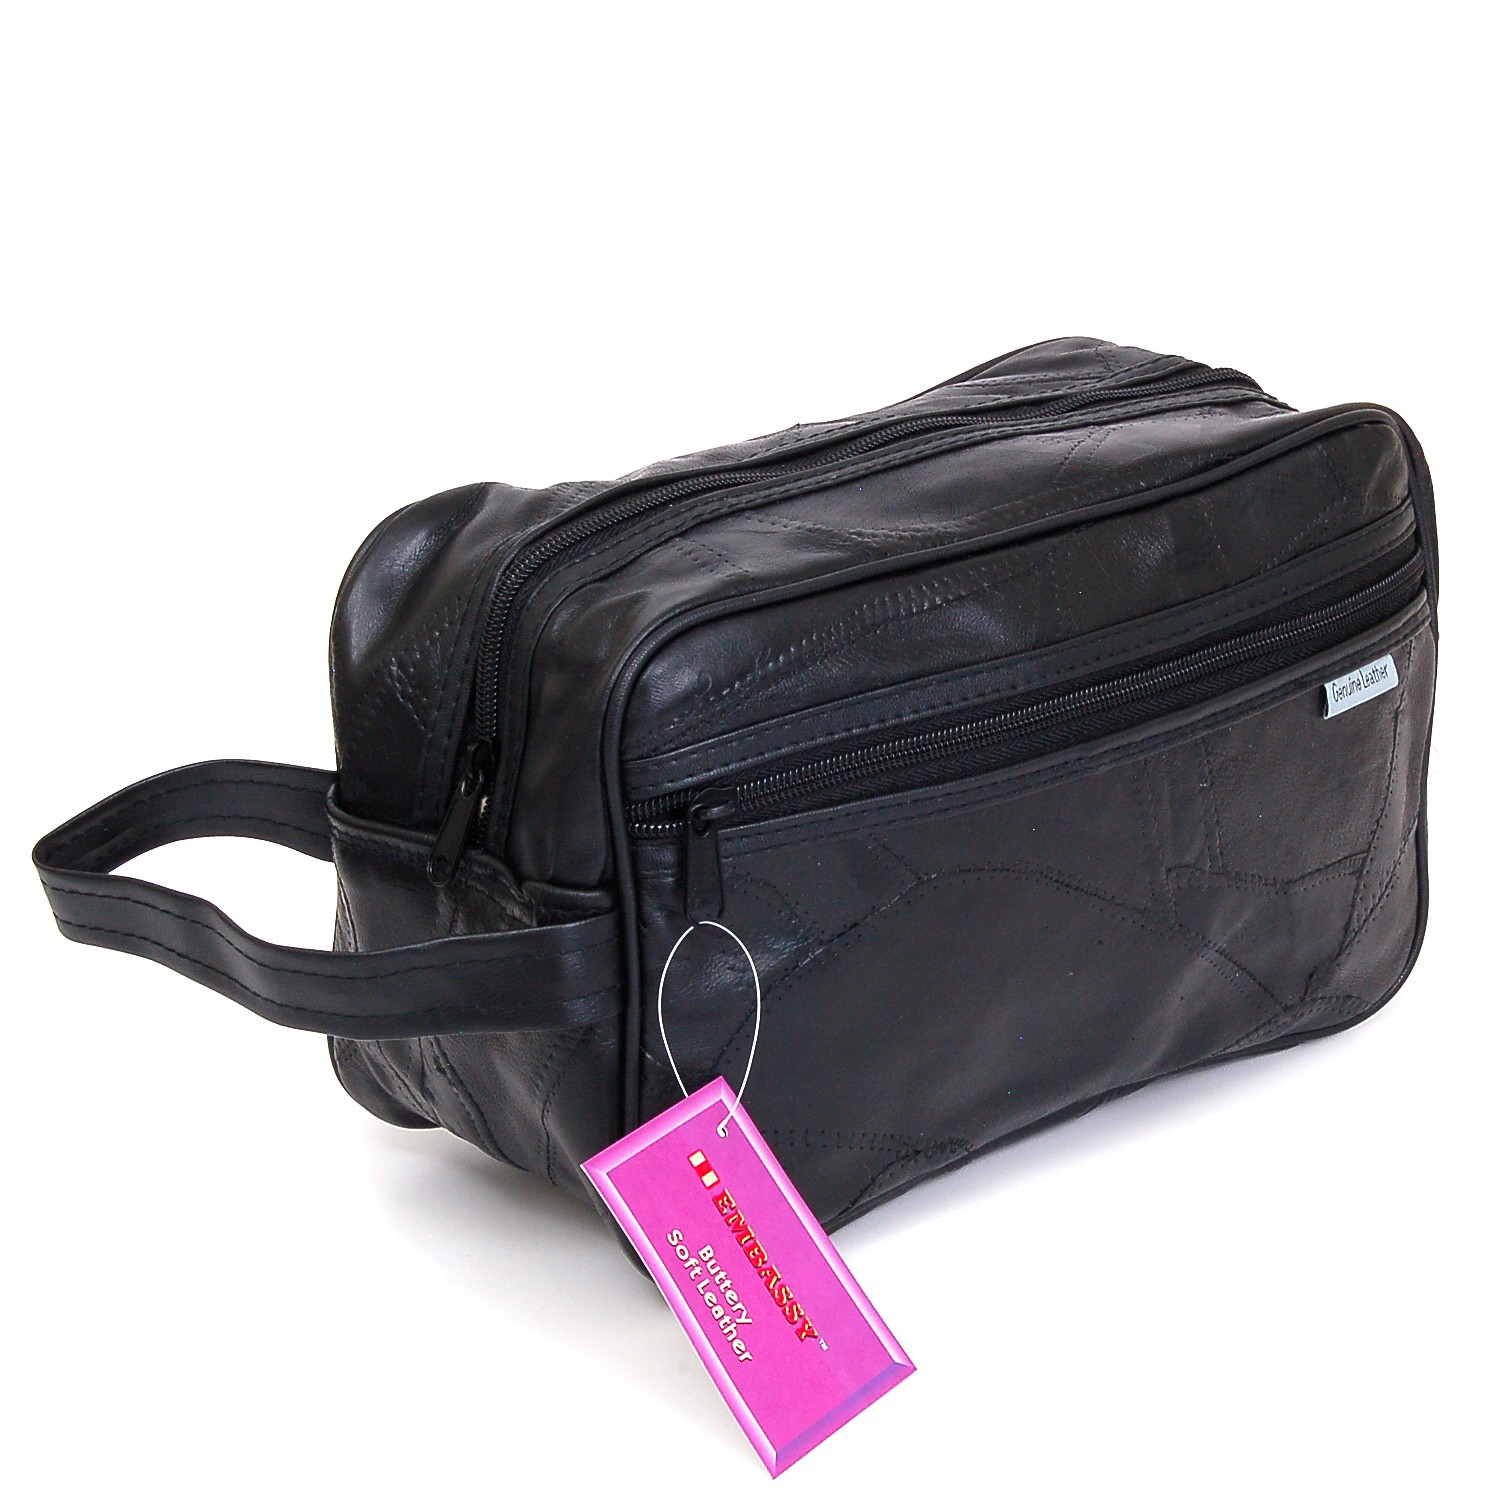 new leather toiletry bag shaving kit travel case tote make. Black Bedroom Furniture Sets. Home Design Ideas